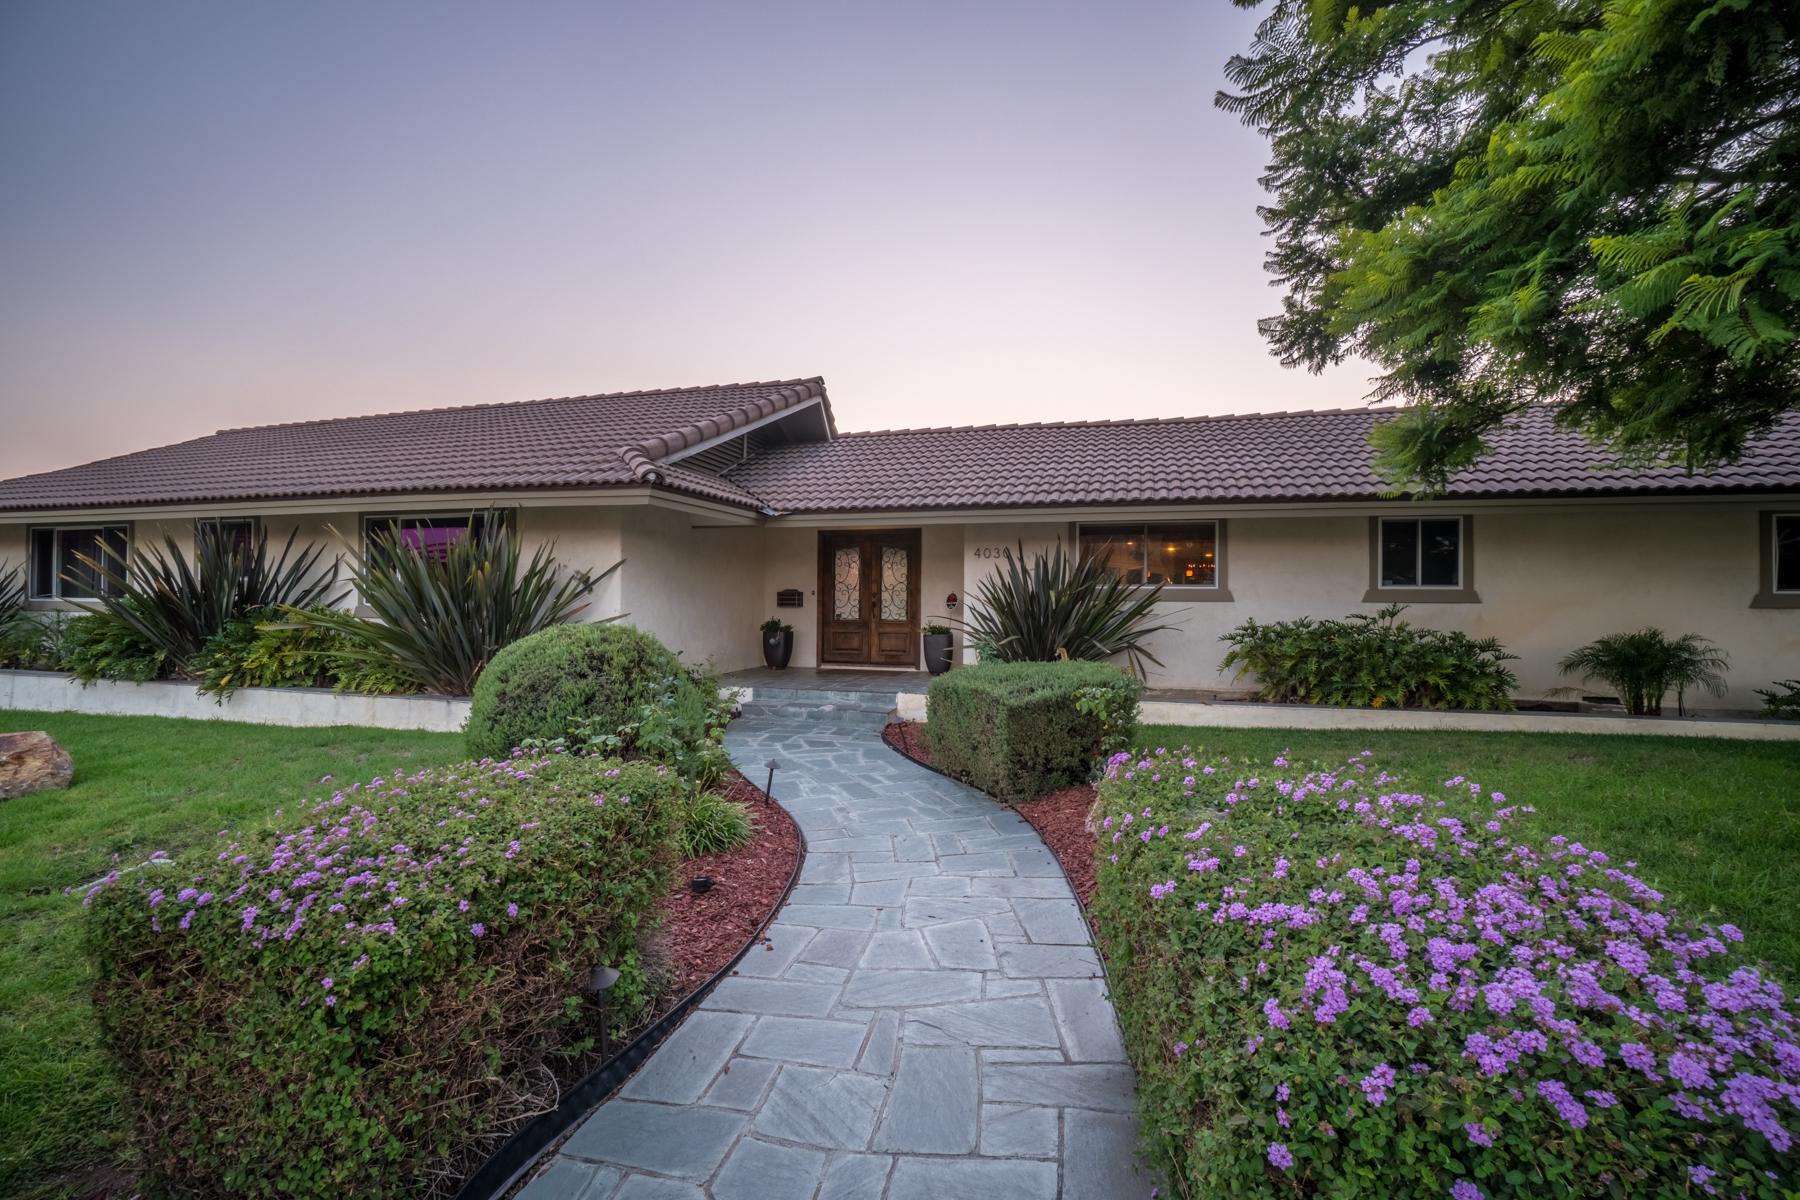 Casa Unifamiliar por un Venta en 4030 Bandini Street 4030 Bandini Street San Diego, California 92103 Estados Unidos